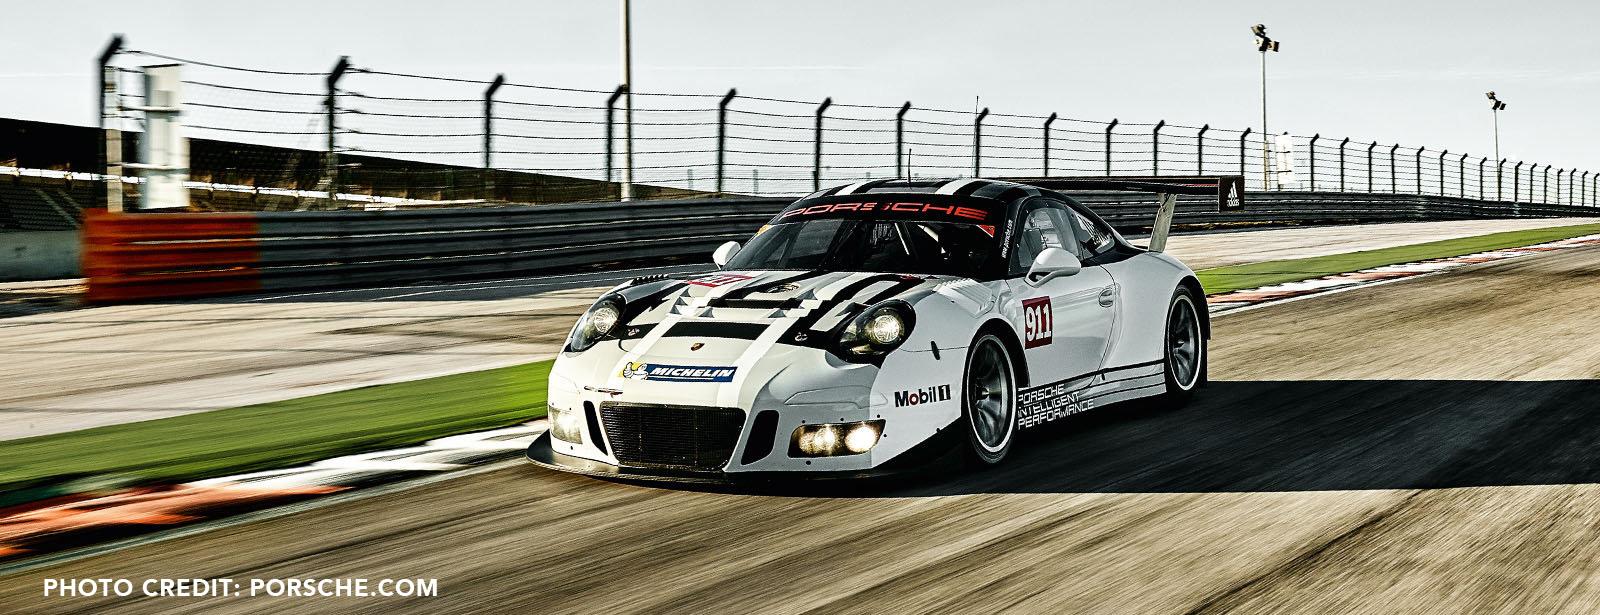 Porsche 911 GT3 R (991) – The Racers Group high-performance